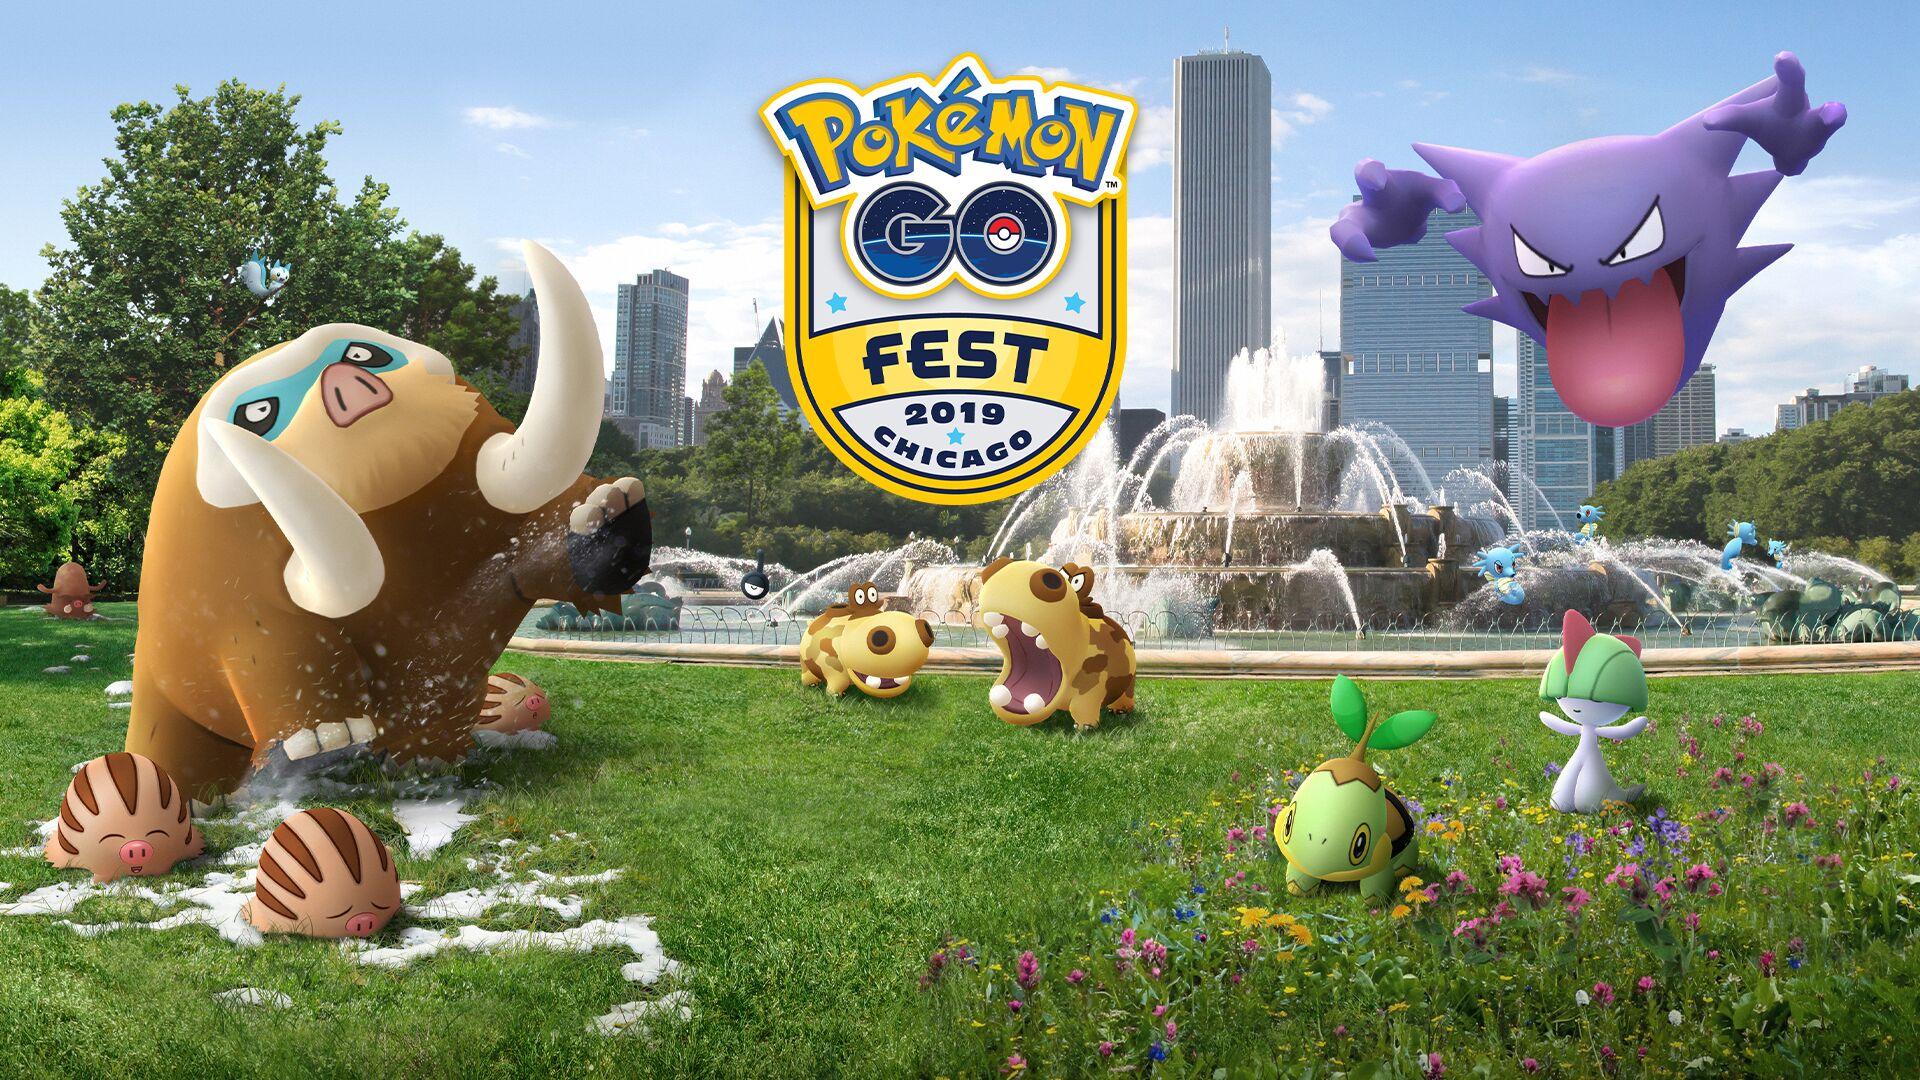 Pokémon Go Fest 2019: dates, cities, and ticket sales